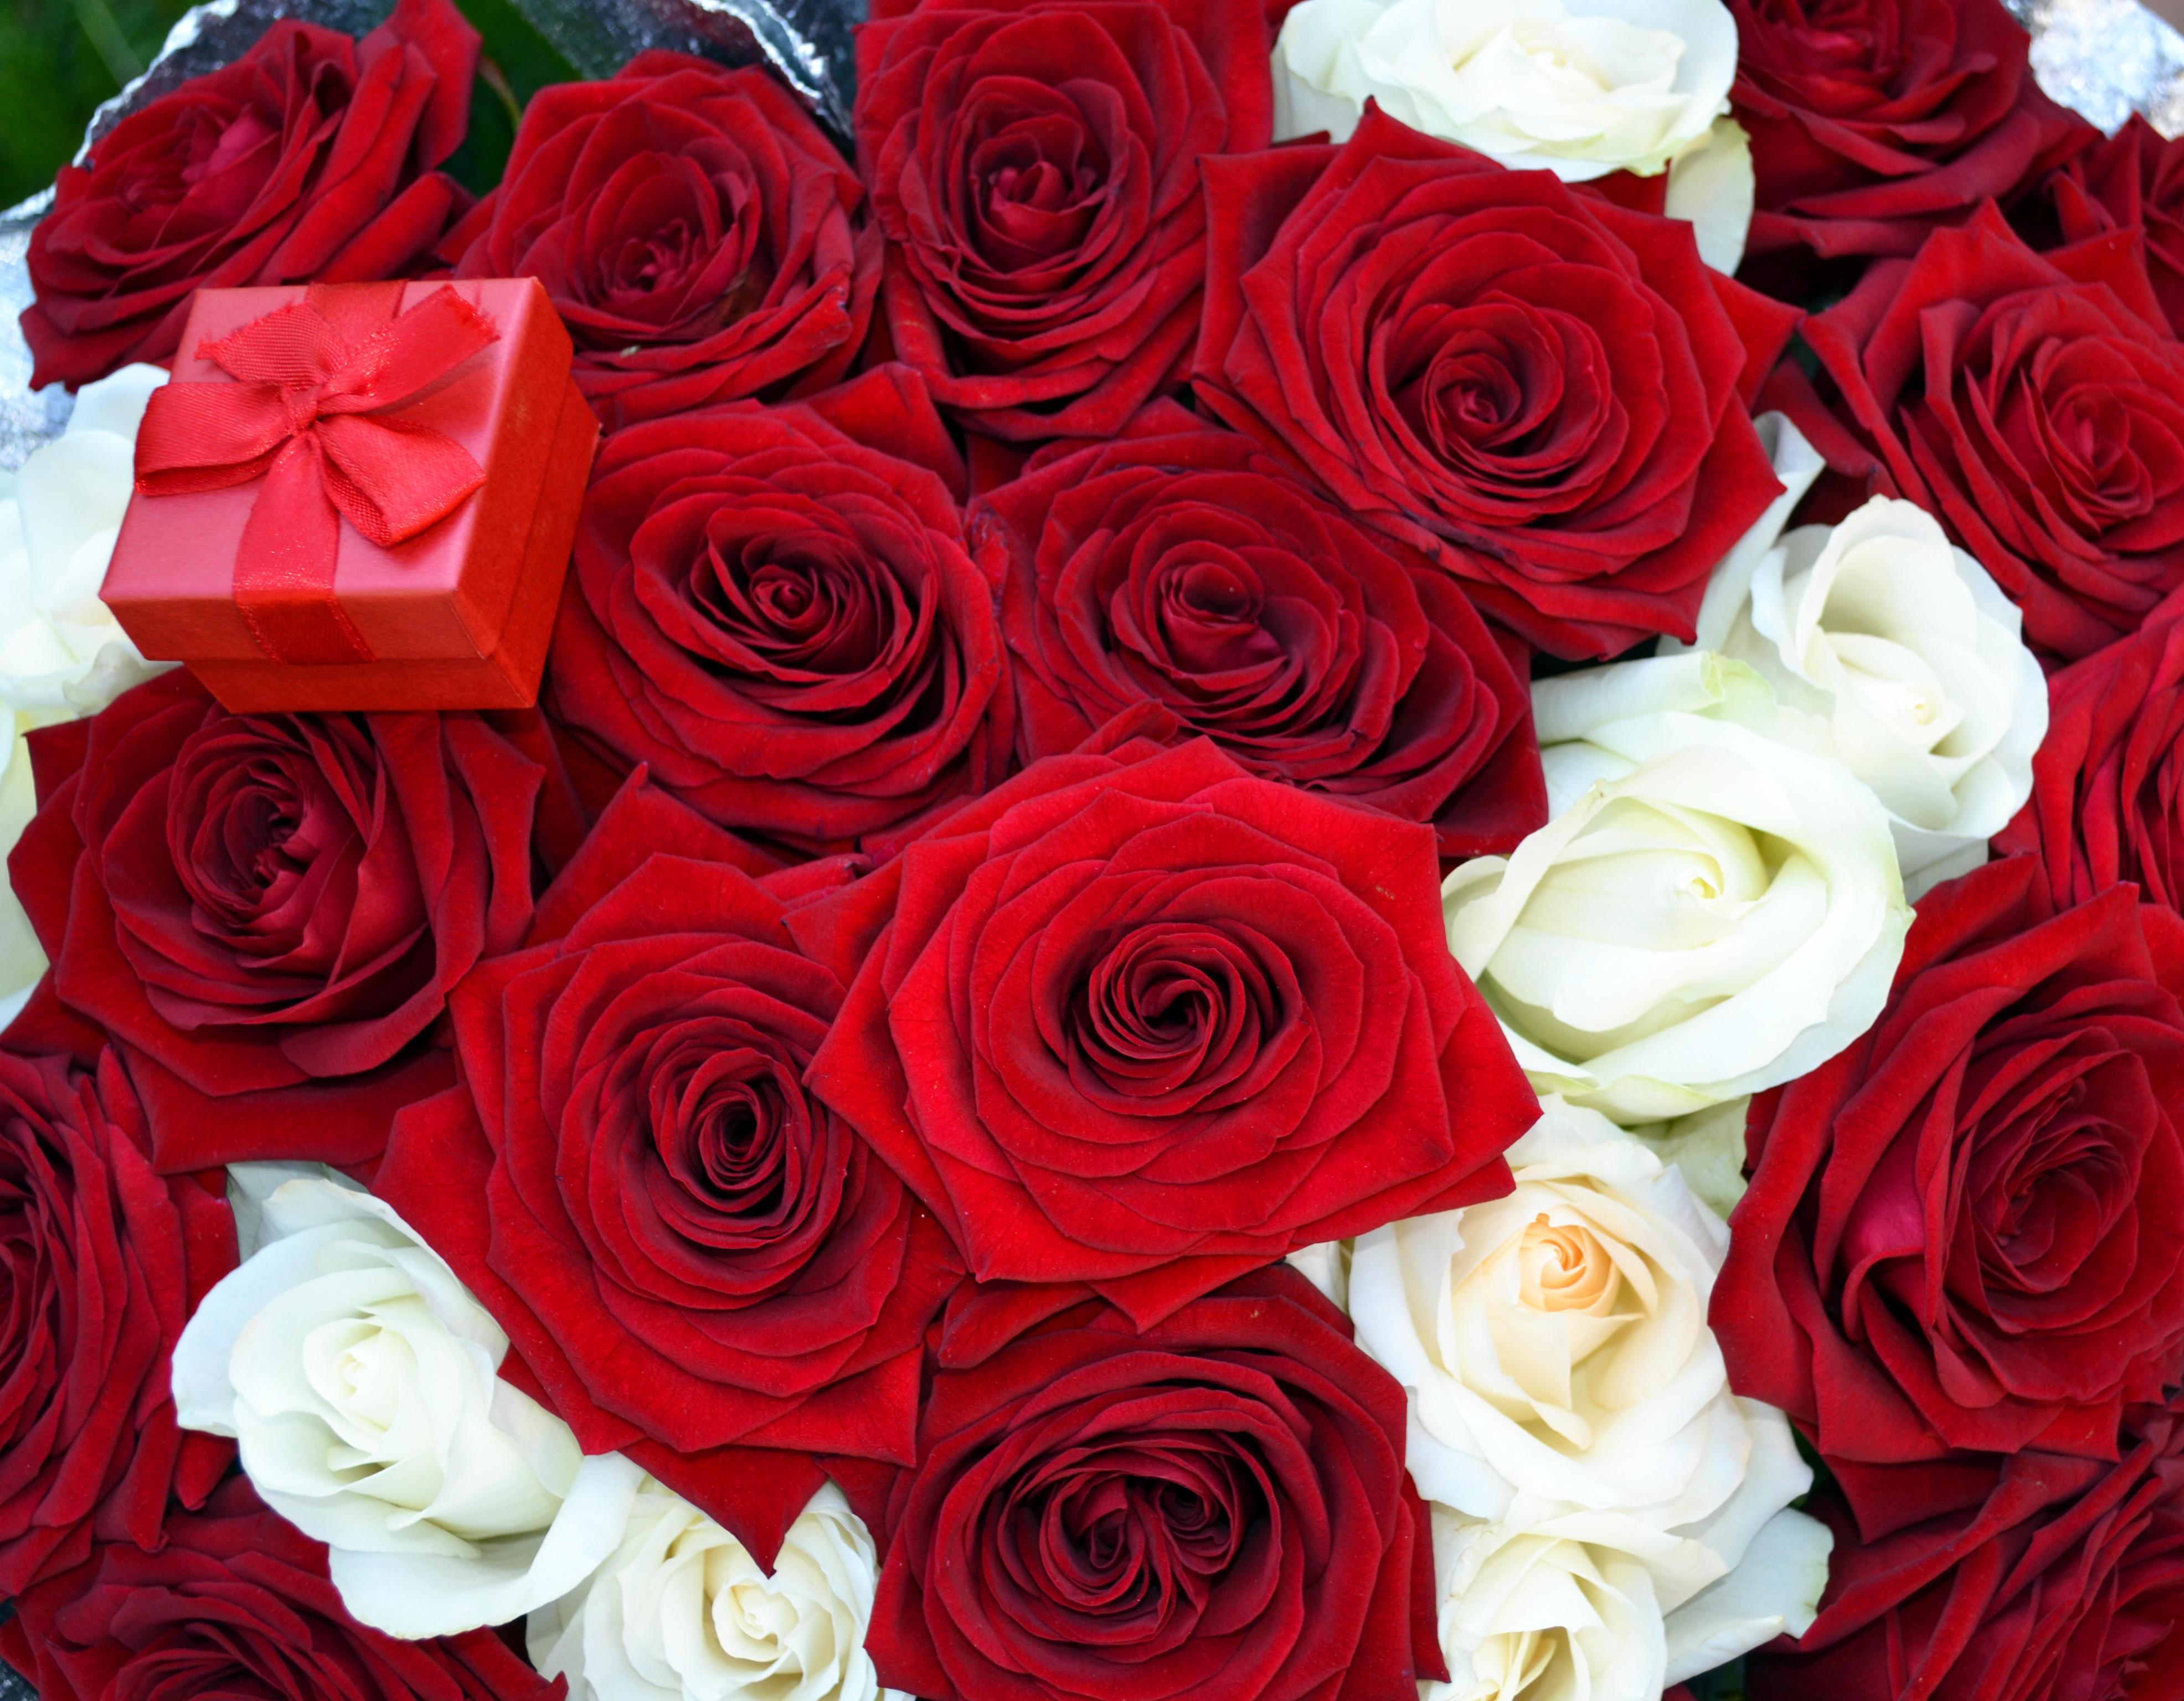 картинки алые розы большие как быстро